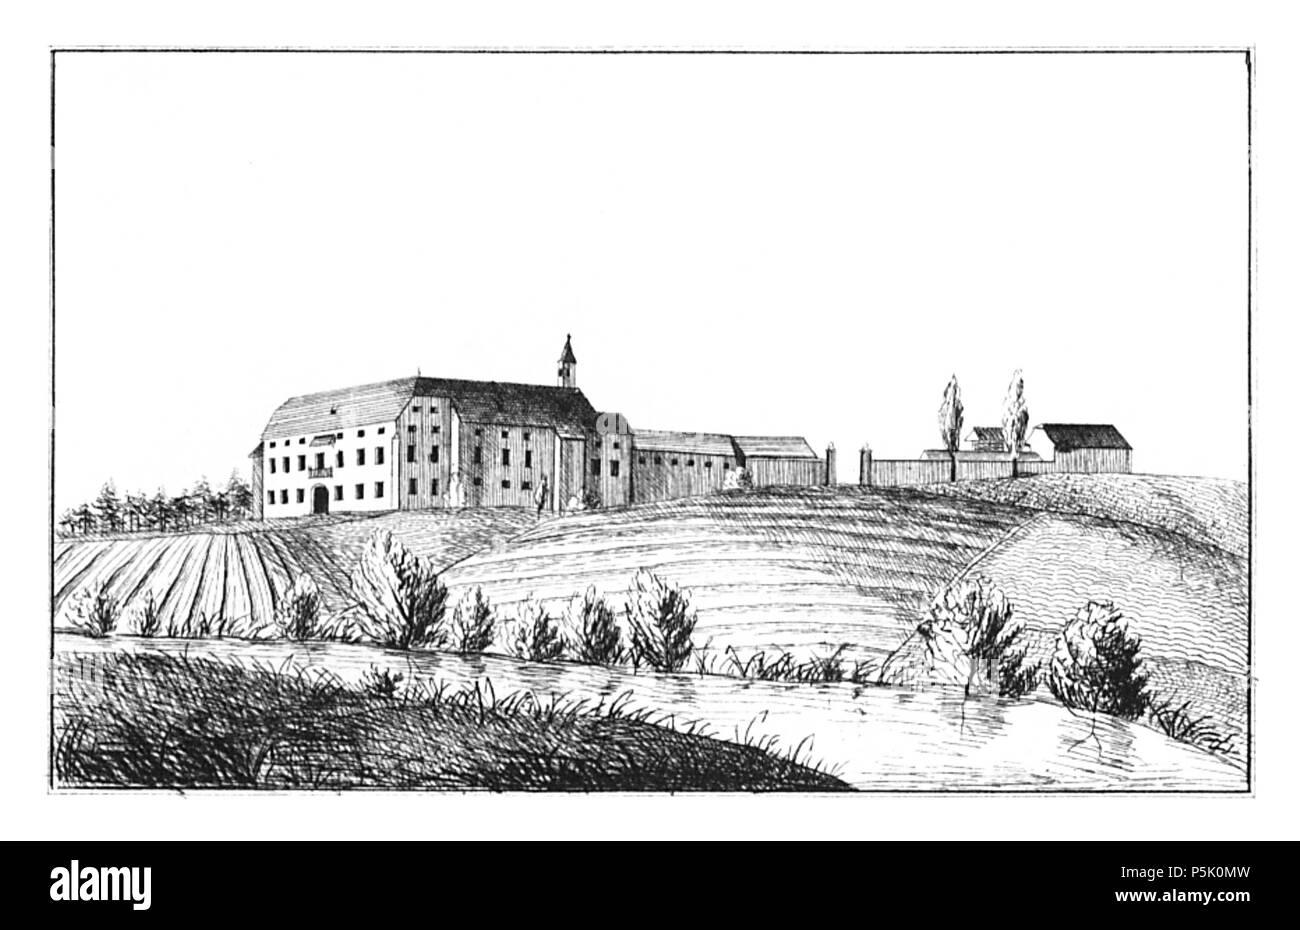 N/A  J  F  Kaiser - lithographirte Ansichten der Steyermärkischen